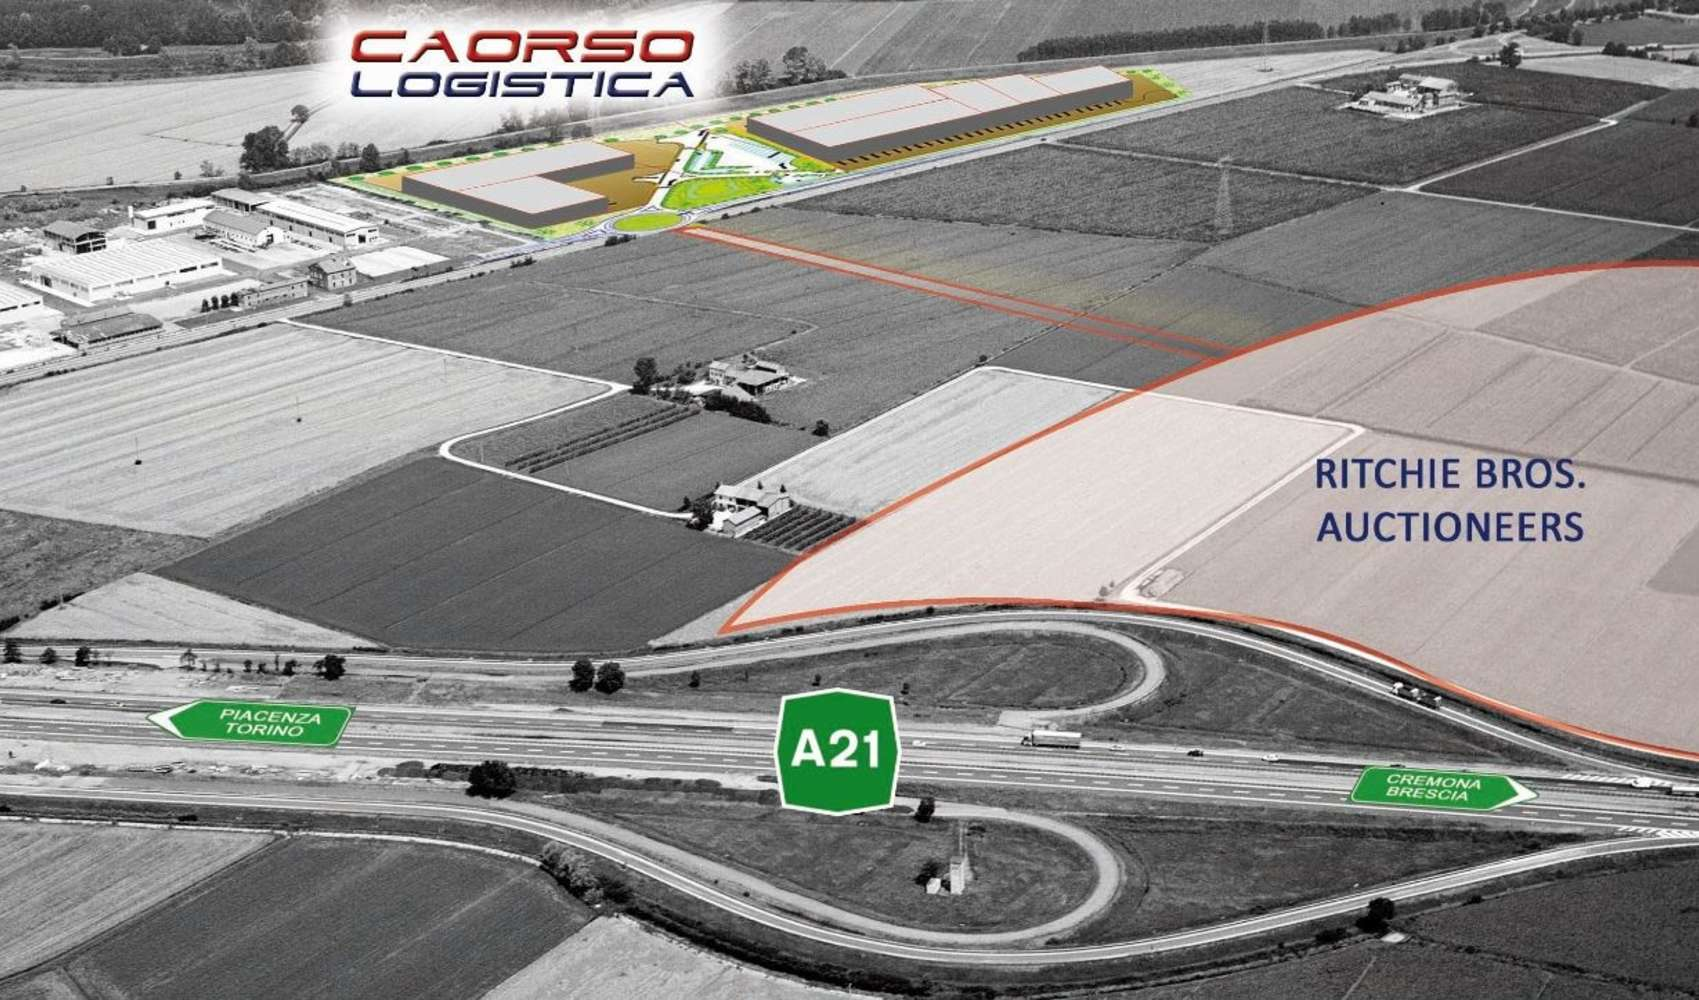 Magazzini industriali e logistici Caorso, 29012 - Caorso Logistica